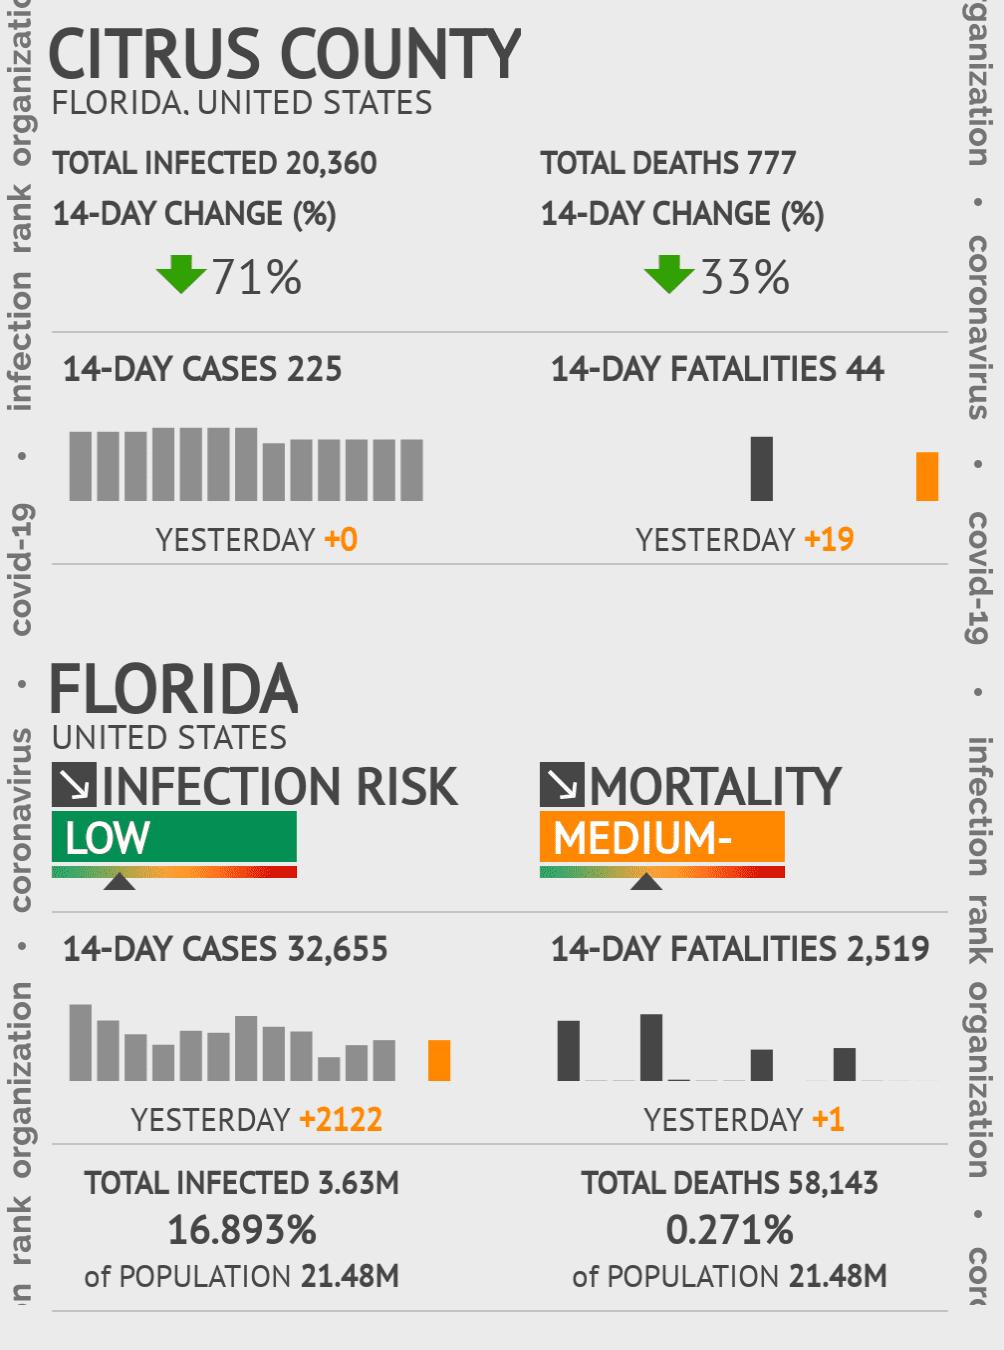 Citrus County Coronavirus Covid-19 Risk of Infection on November 24, 2020